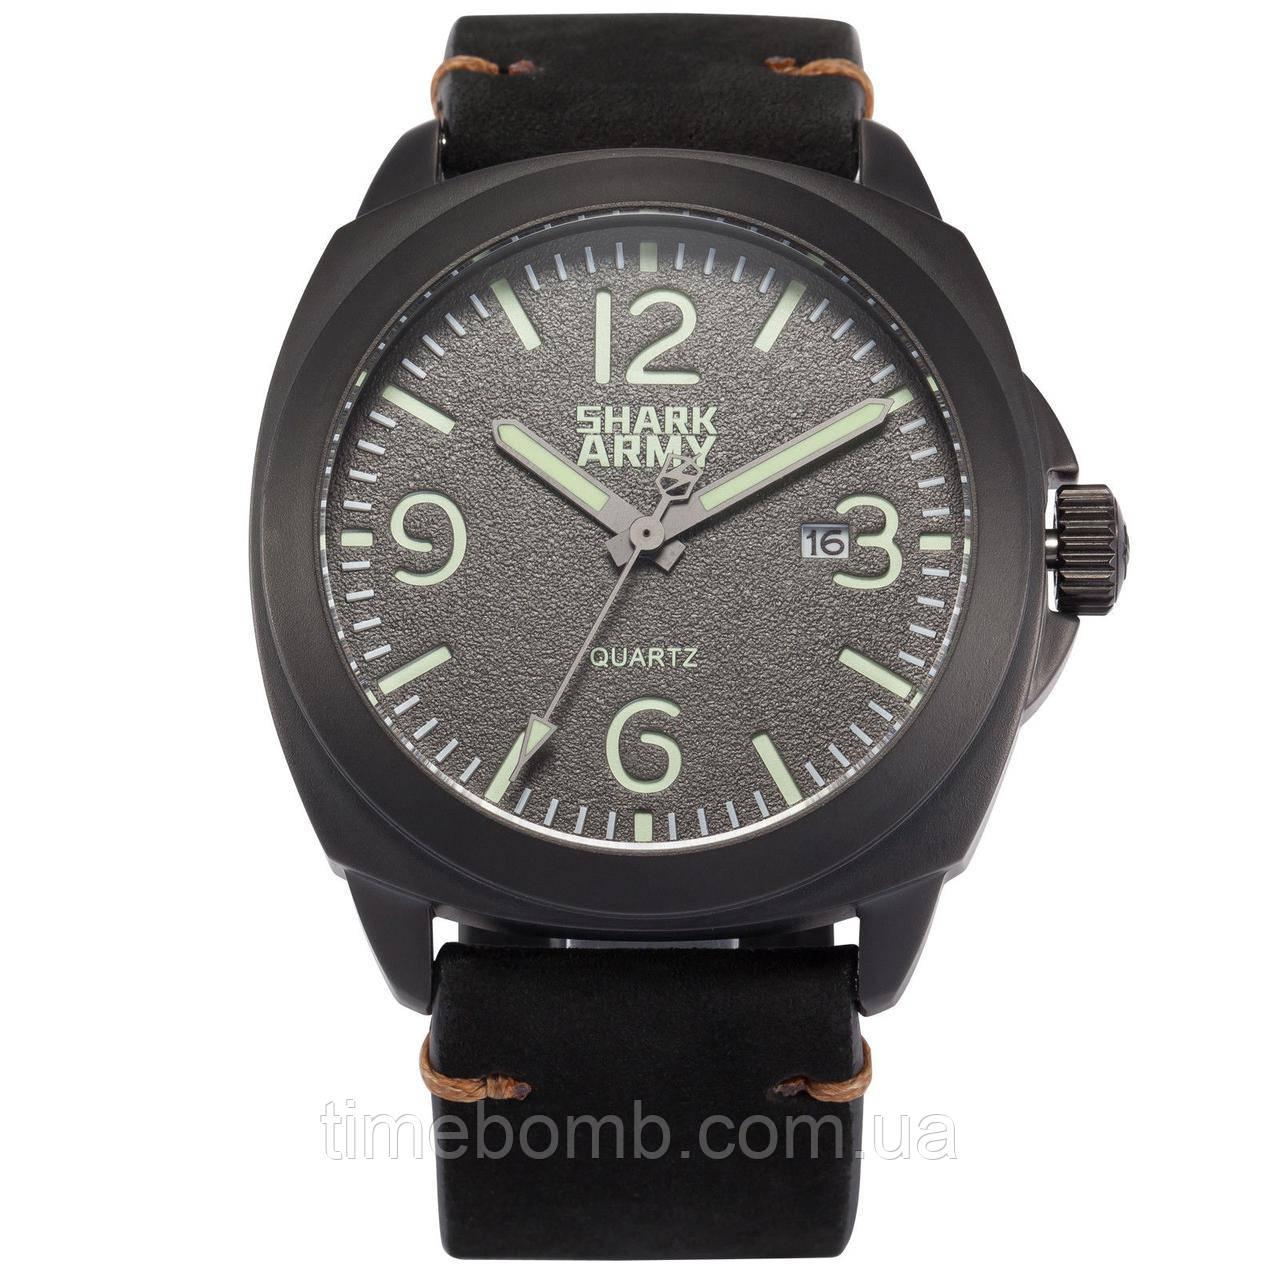 Мужские армейские часы Shark Army Lumin Seal черные